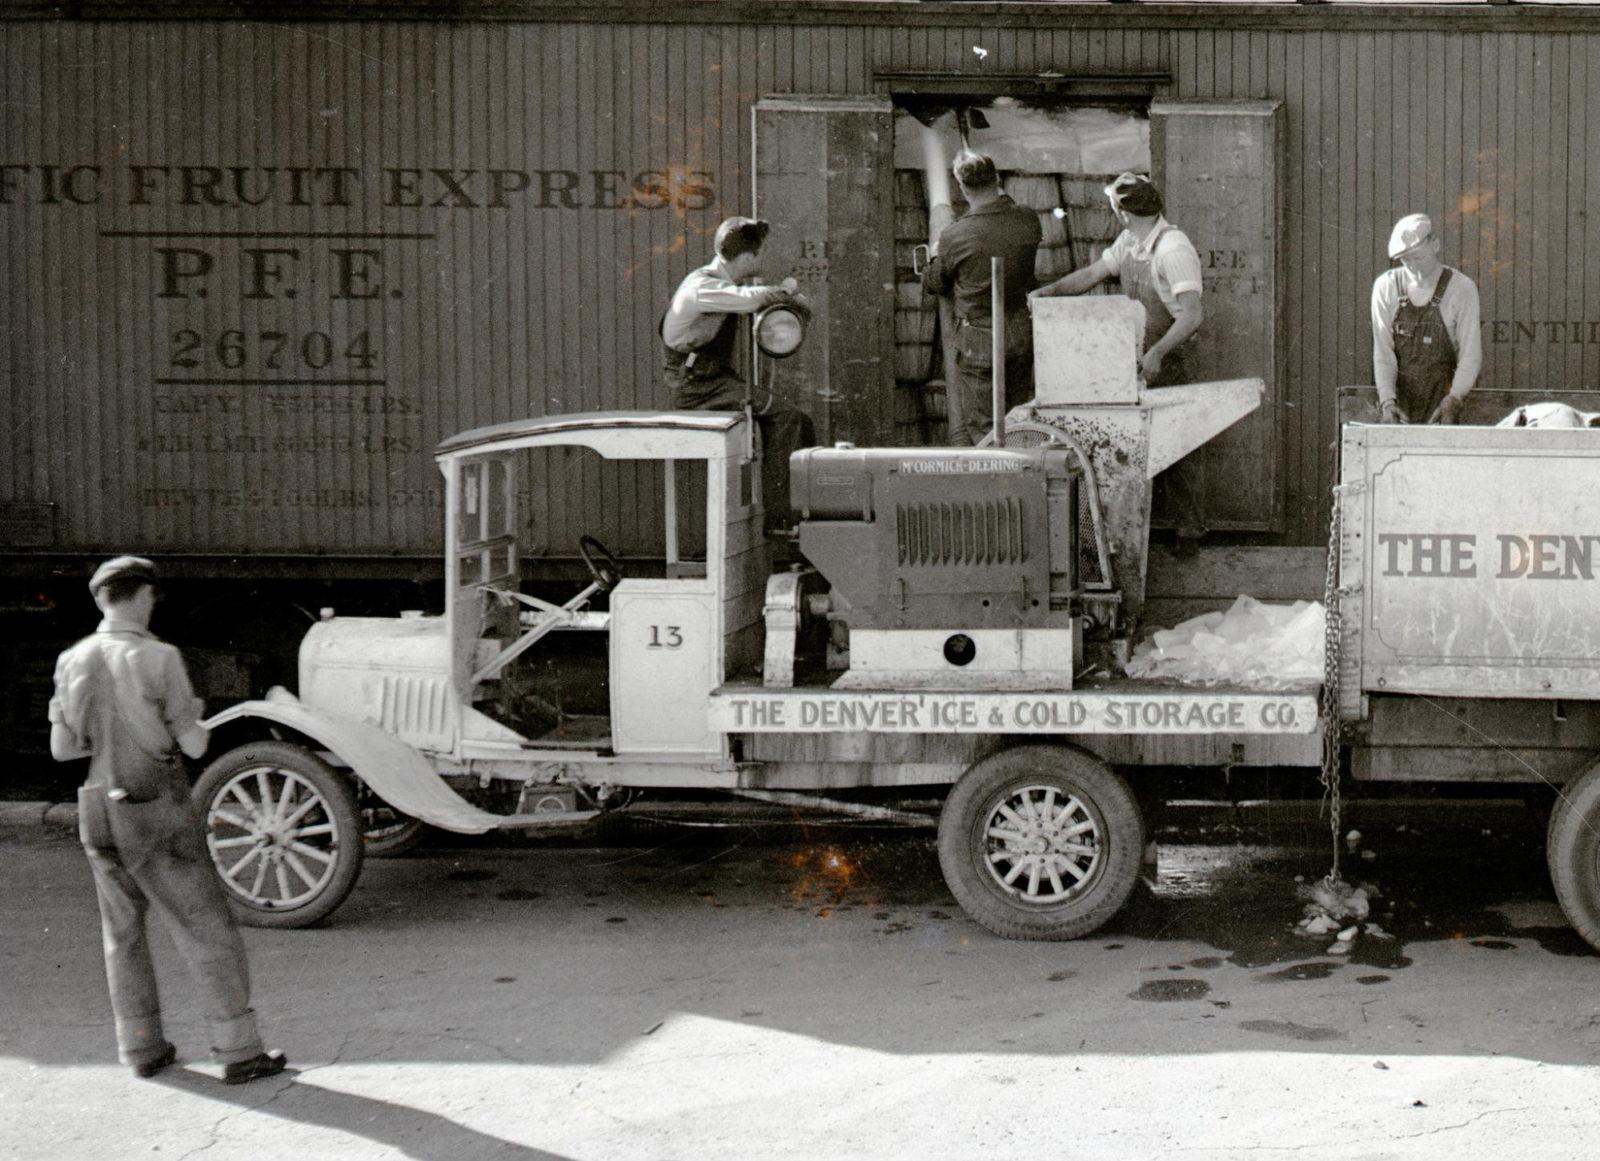 nostalgic photo of a business